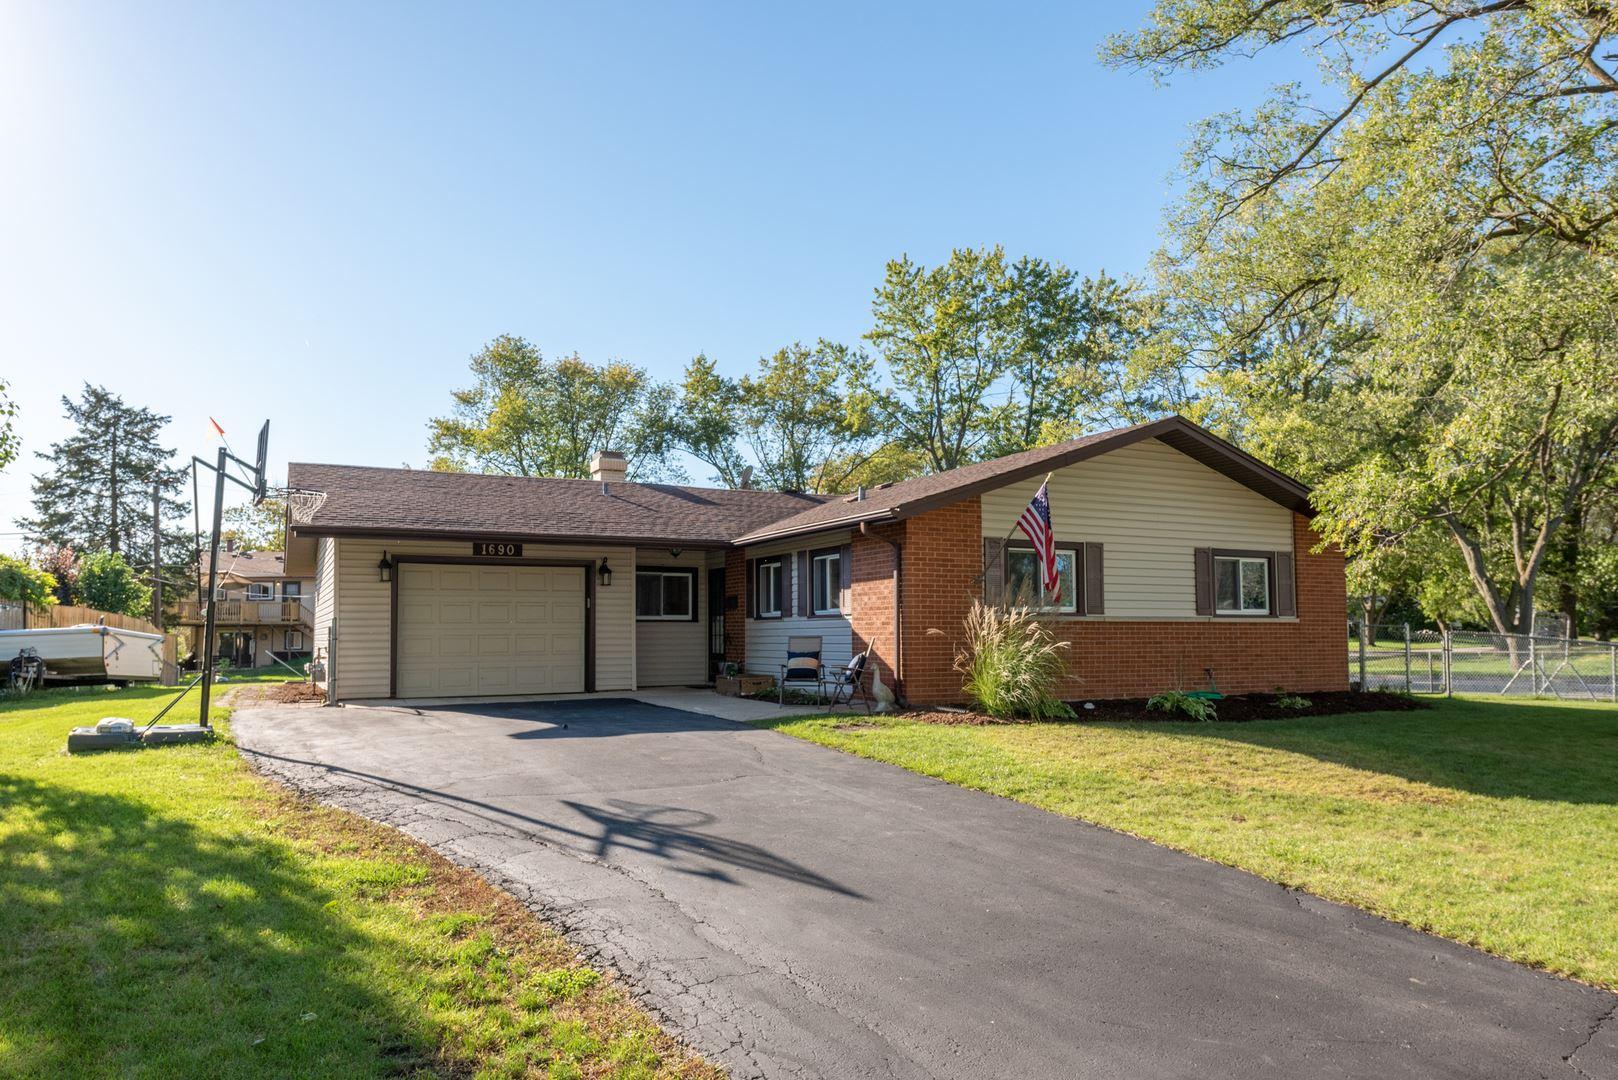 1690 BEDFORD Road, Hoffman Estates, IL 60169 - #: 11251997